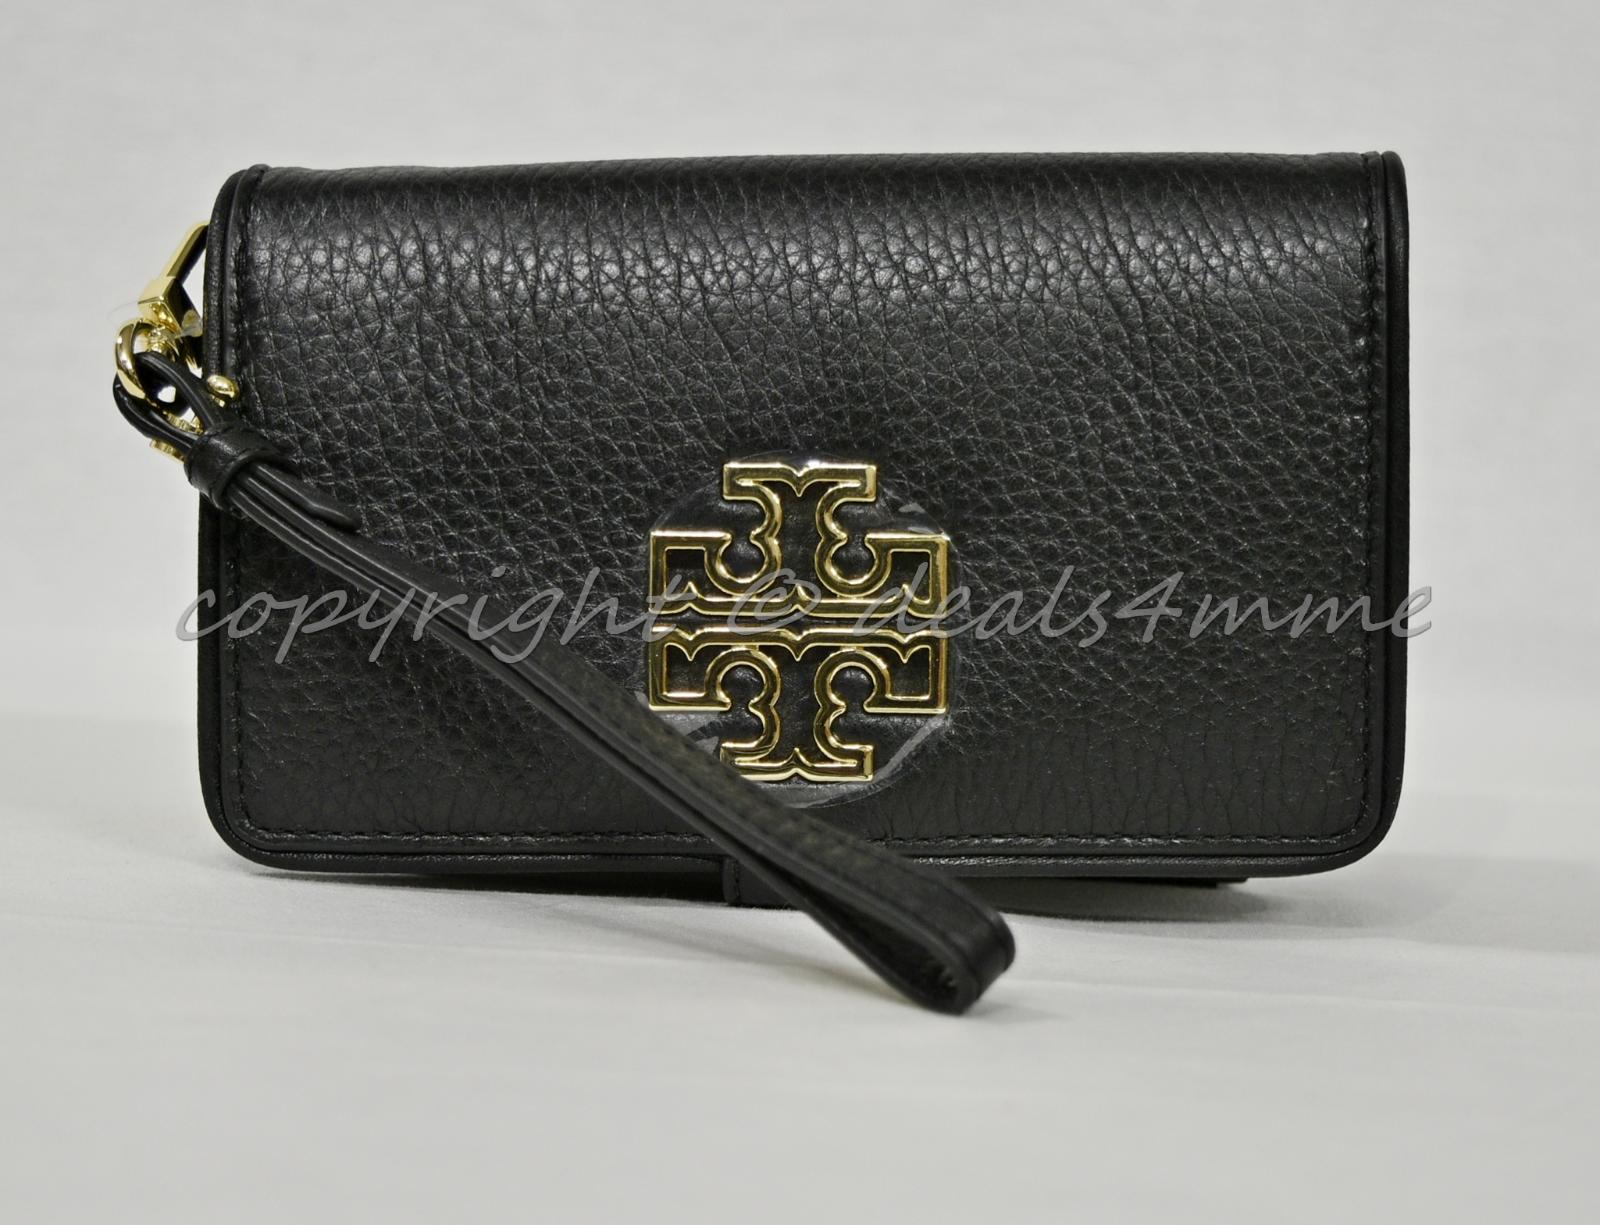 a1a55709da6d Tory Burch Britten Pebble Leather Smartphone Wallet / Wristlet In Black OR  Bark